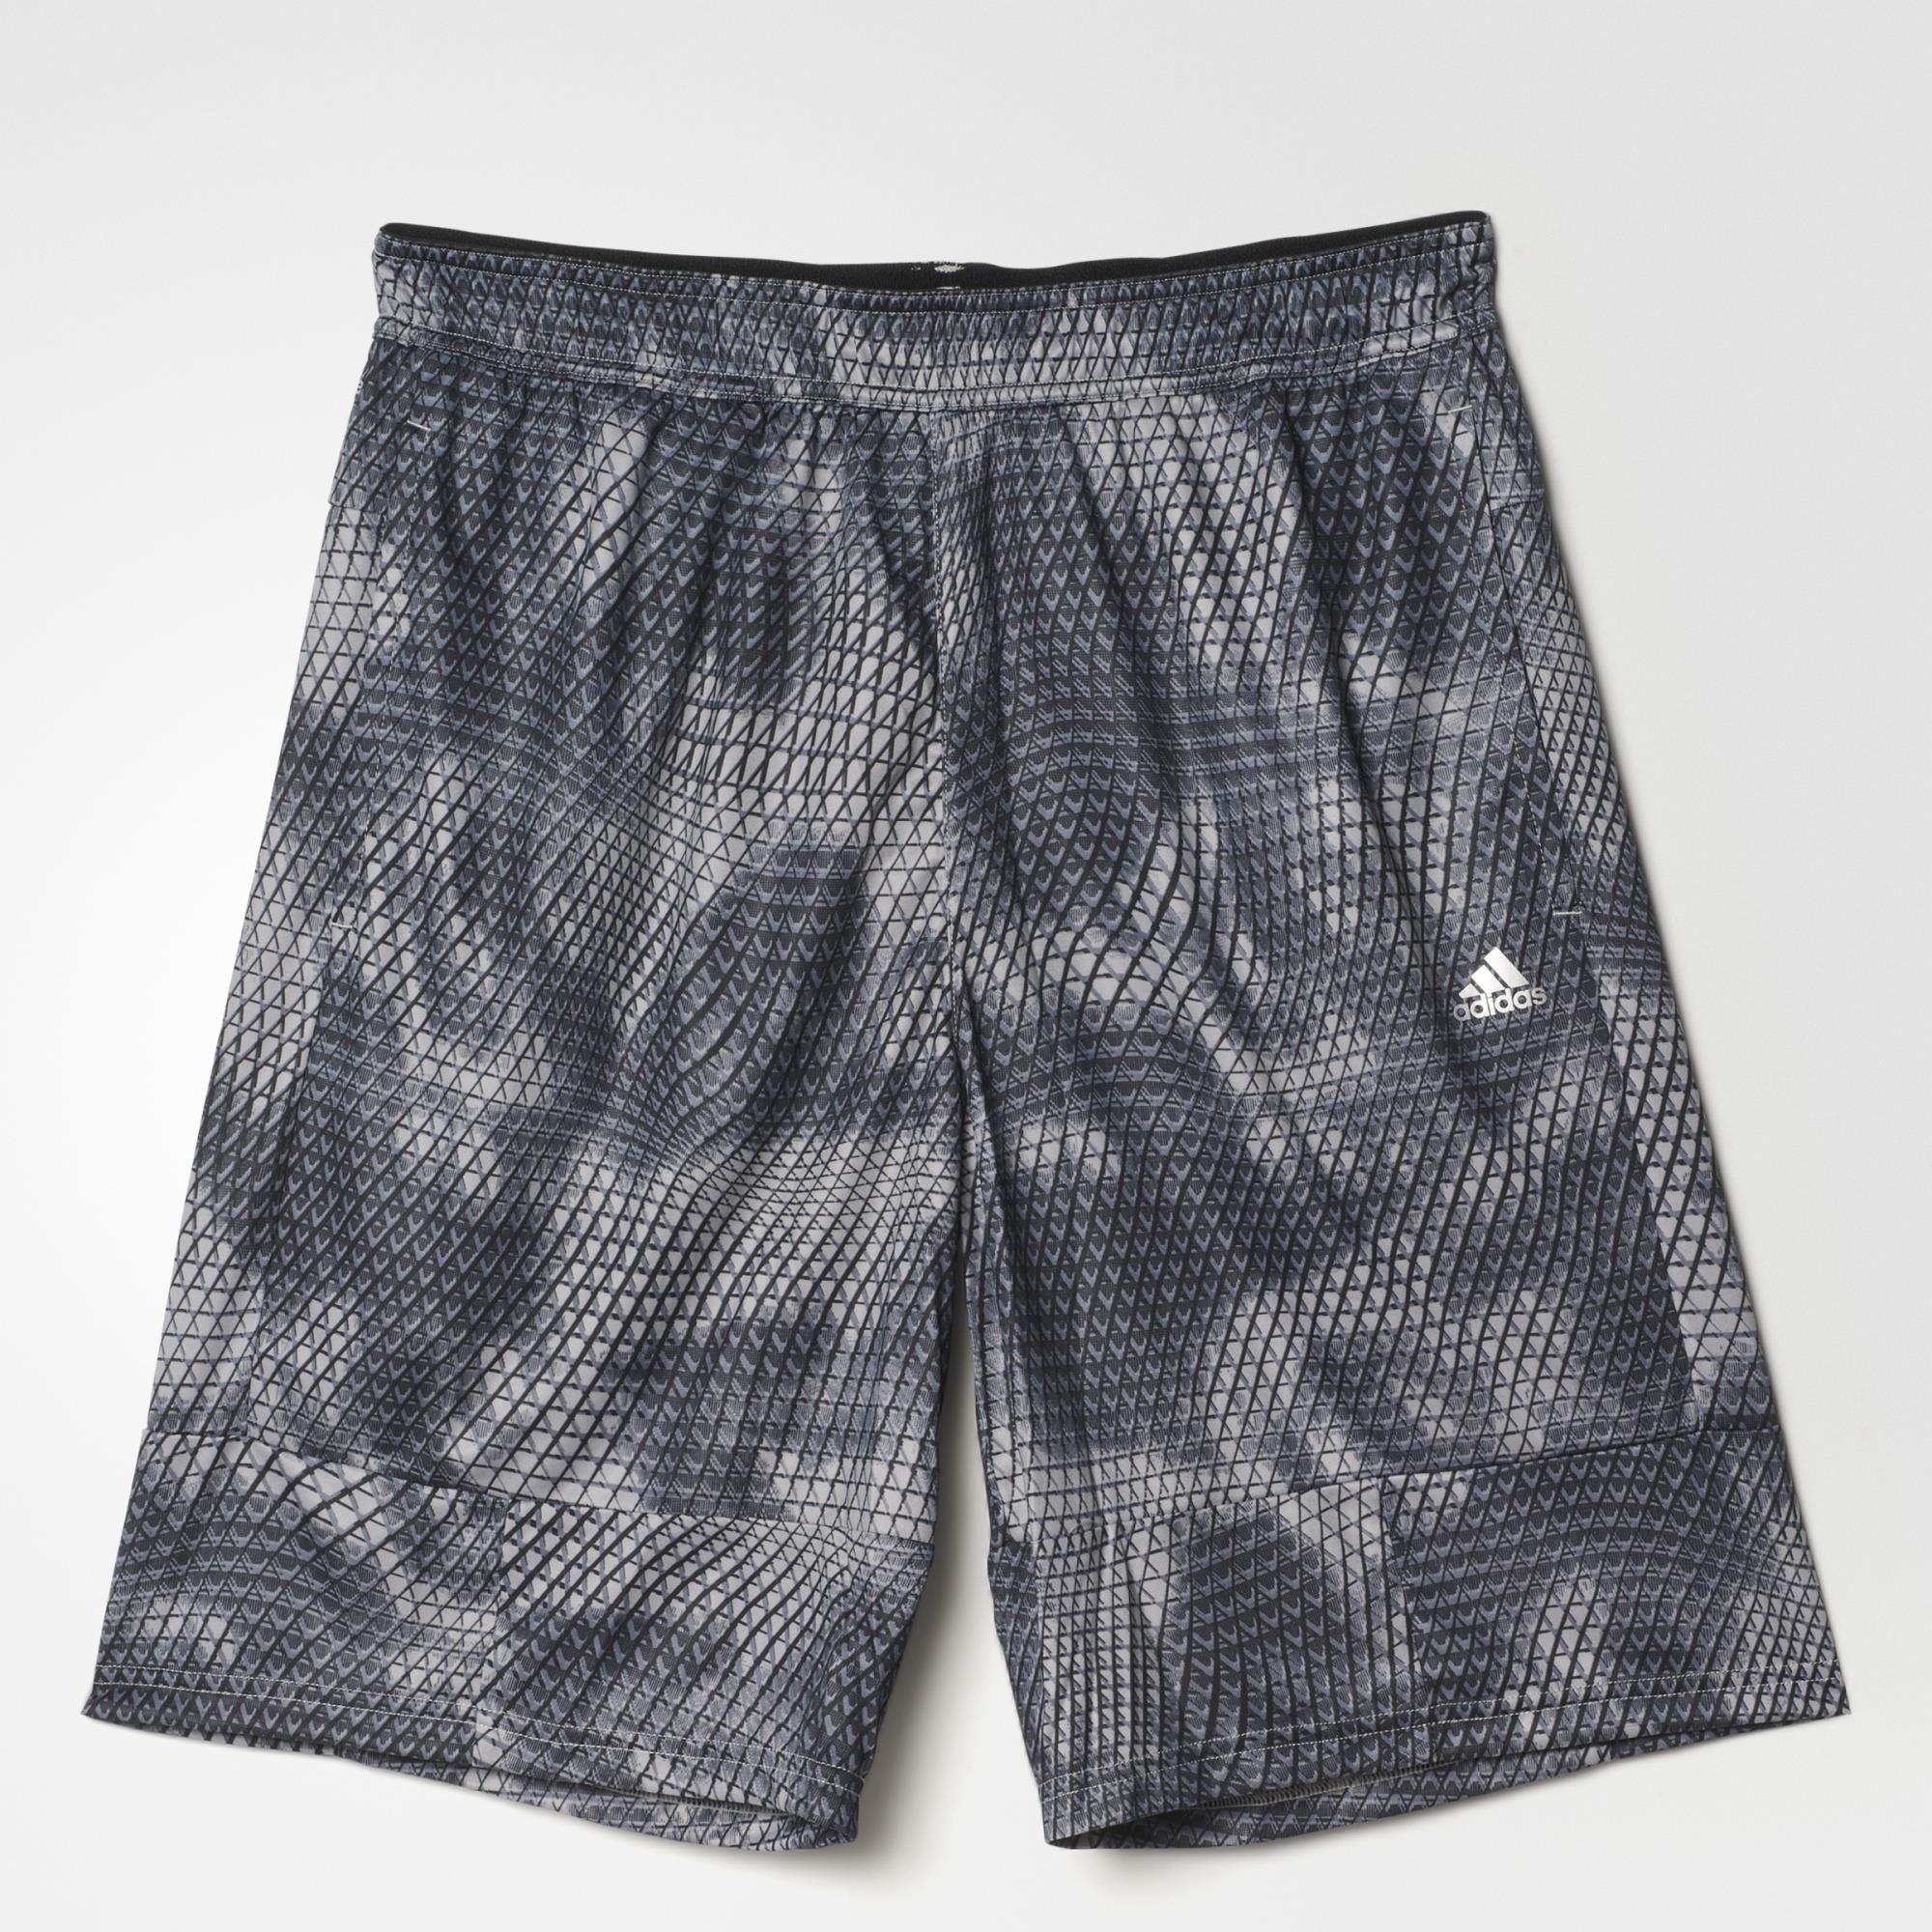 Herren Allover Print Swat Shorts